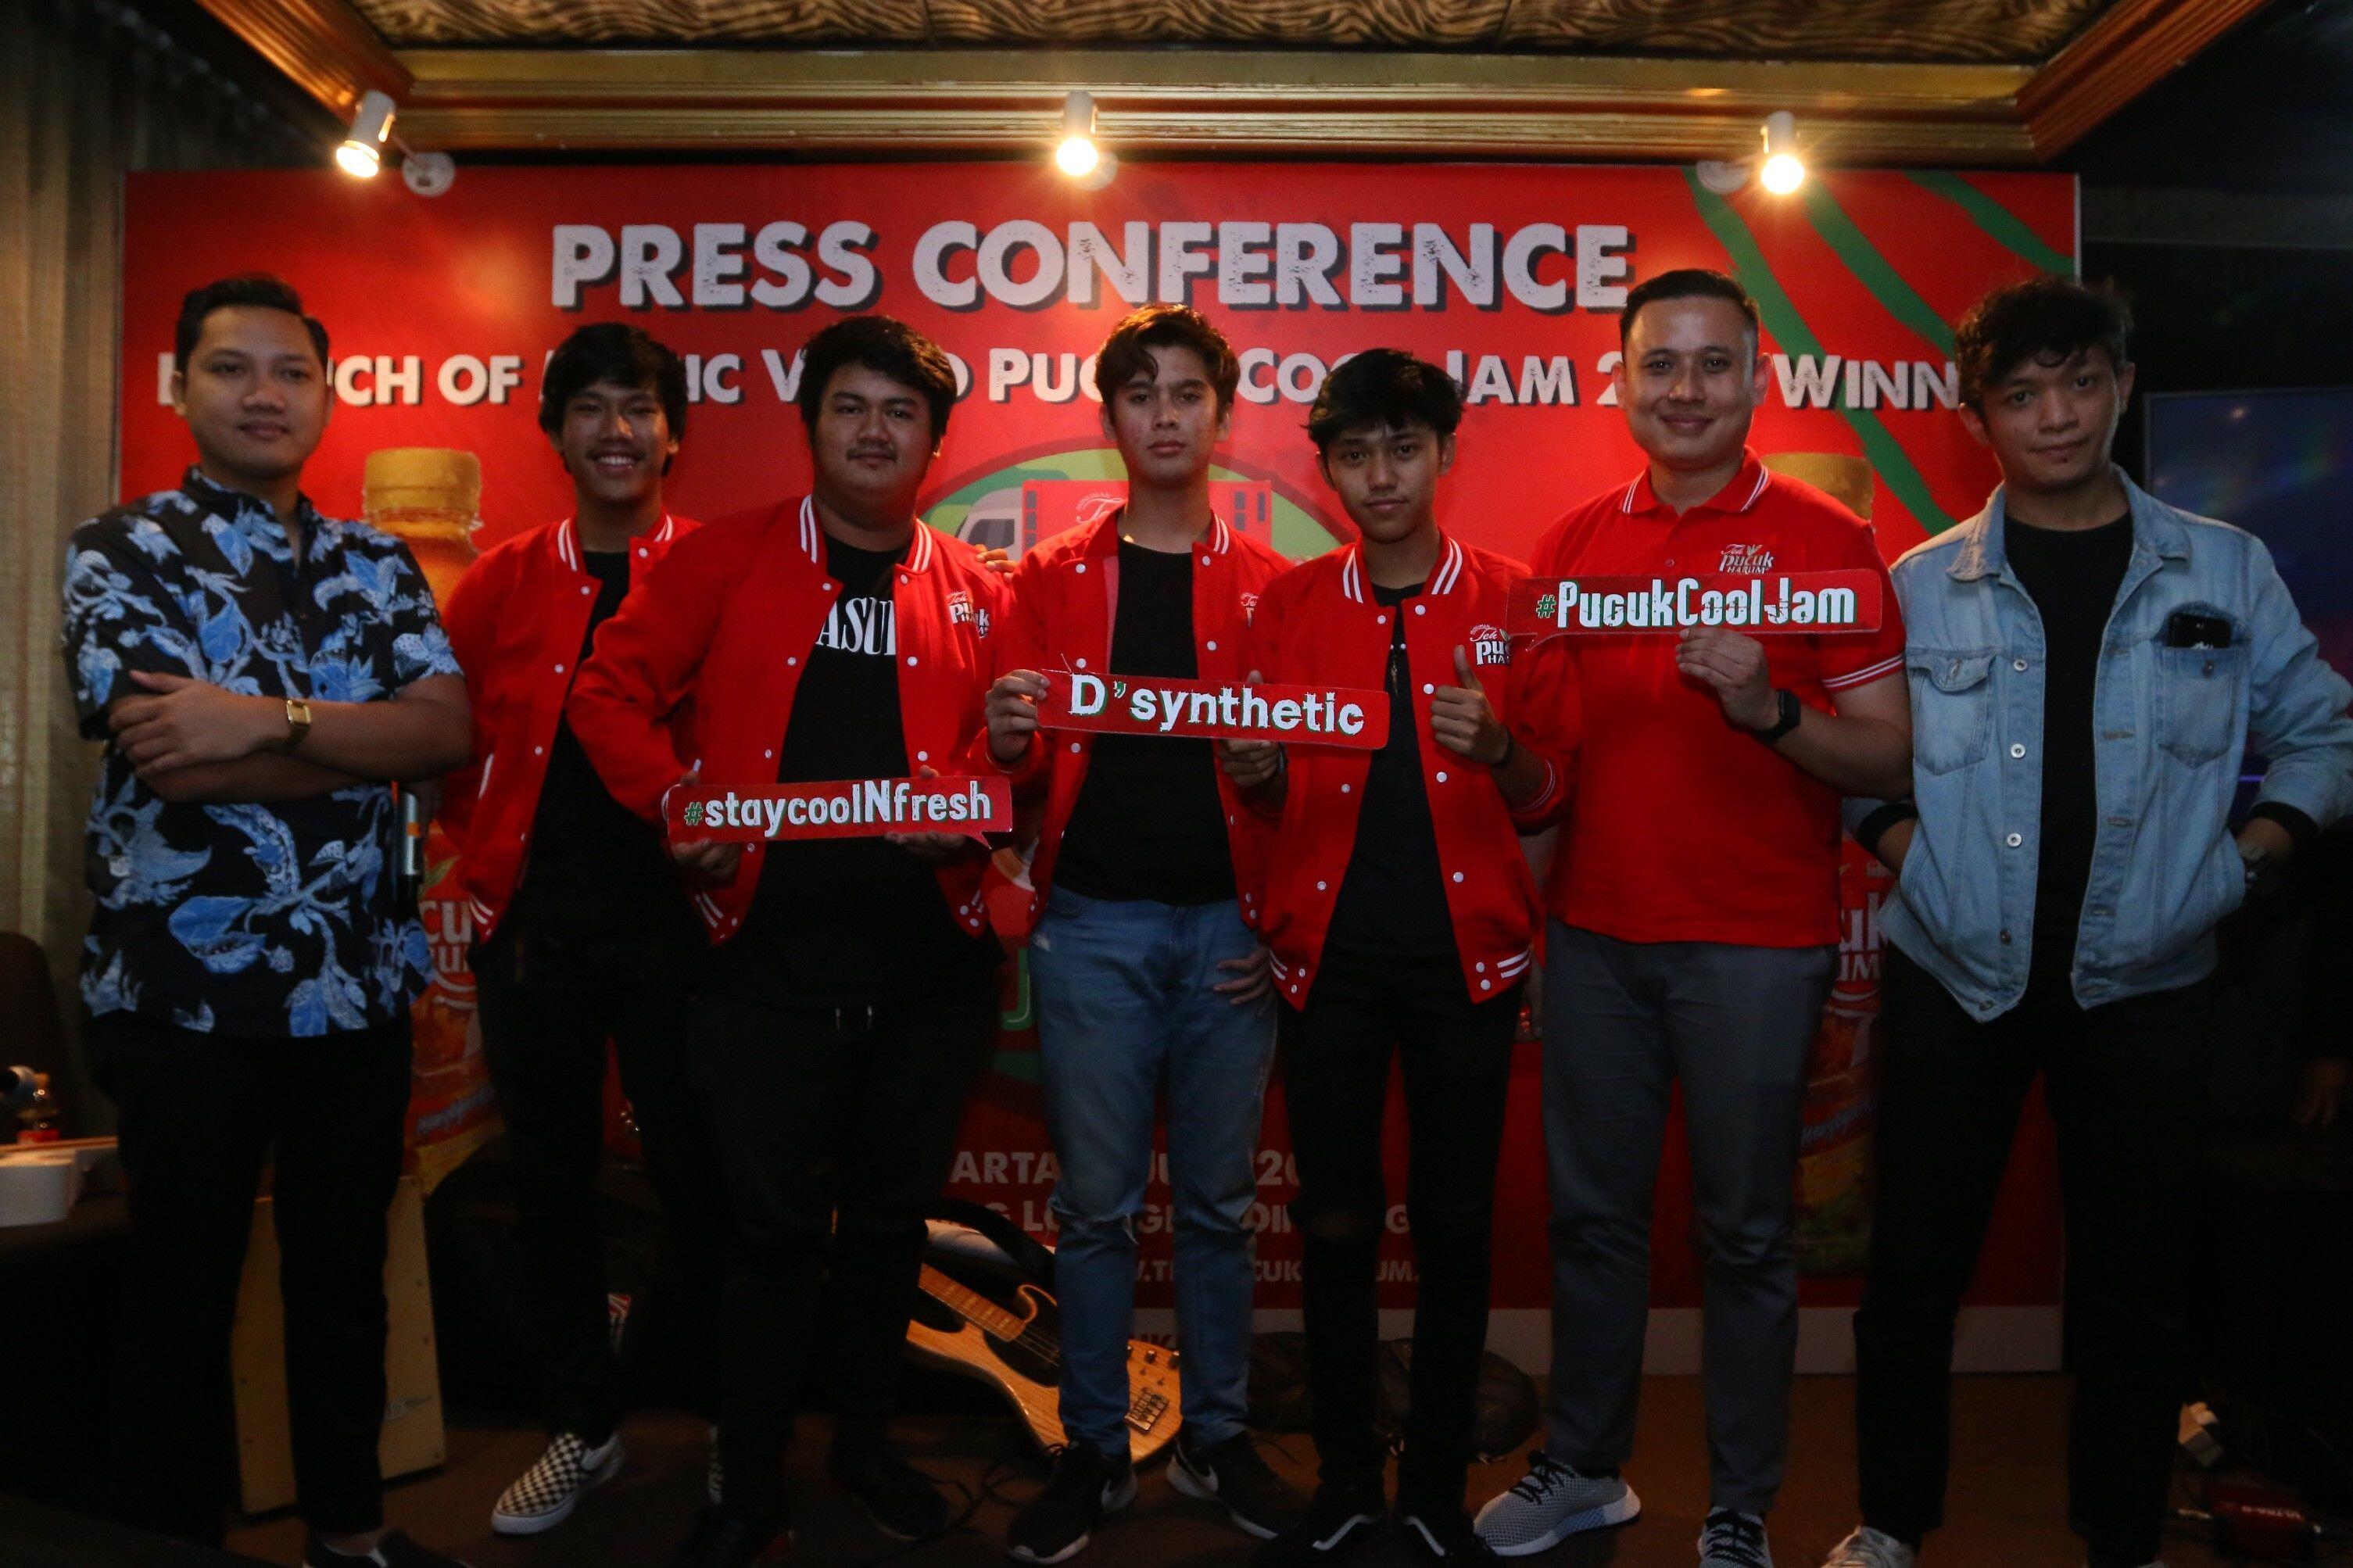 Menangkan Pucuk Cool Jam 2018, 10 Potret Keren Member Band D'synthetic